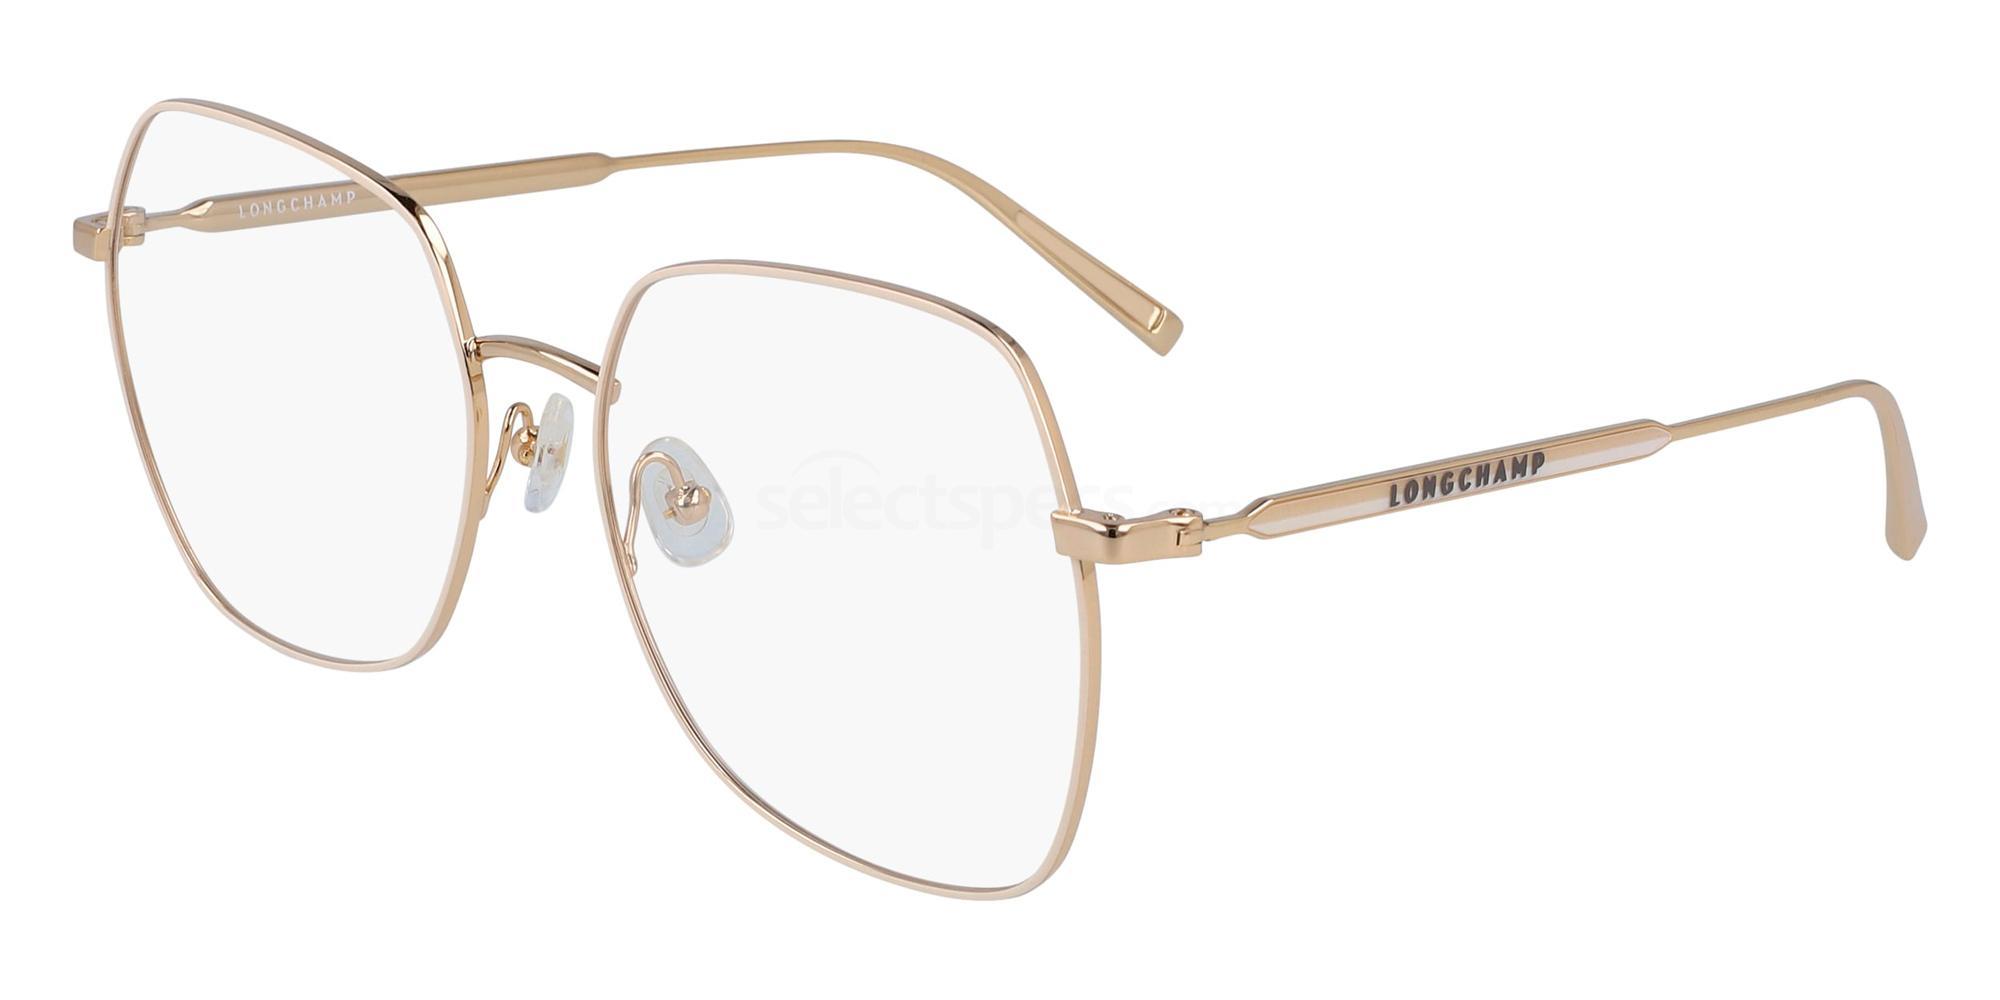 713 LO2129 Glasses, LONGCHAMP